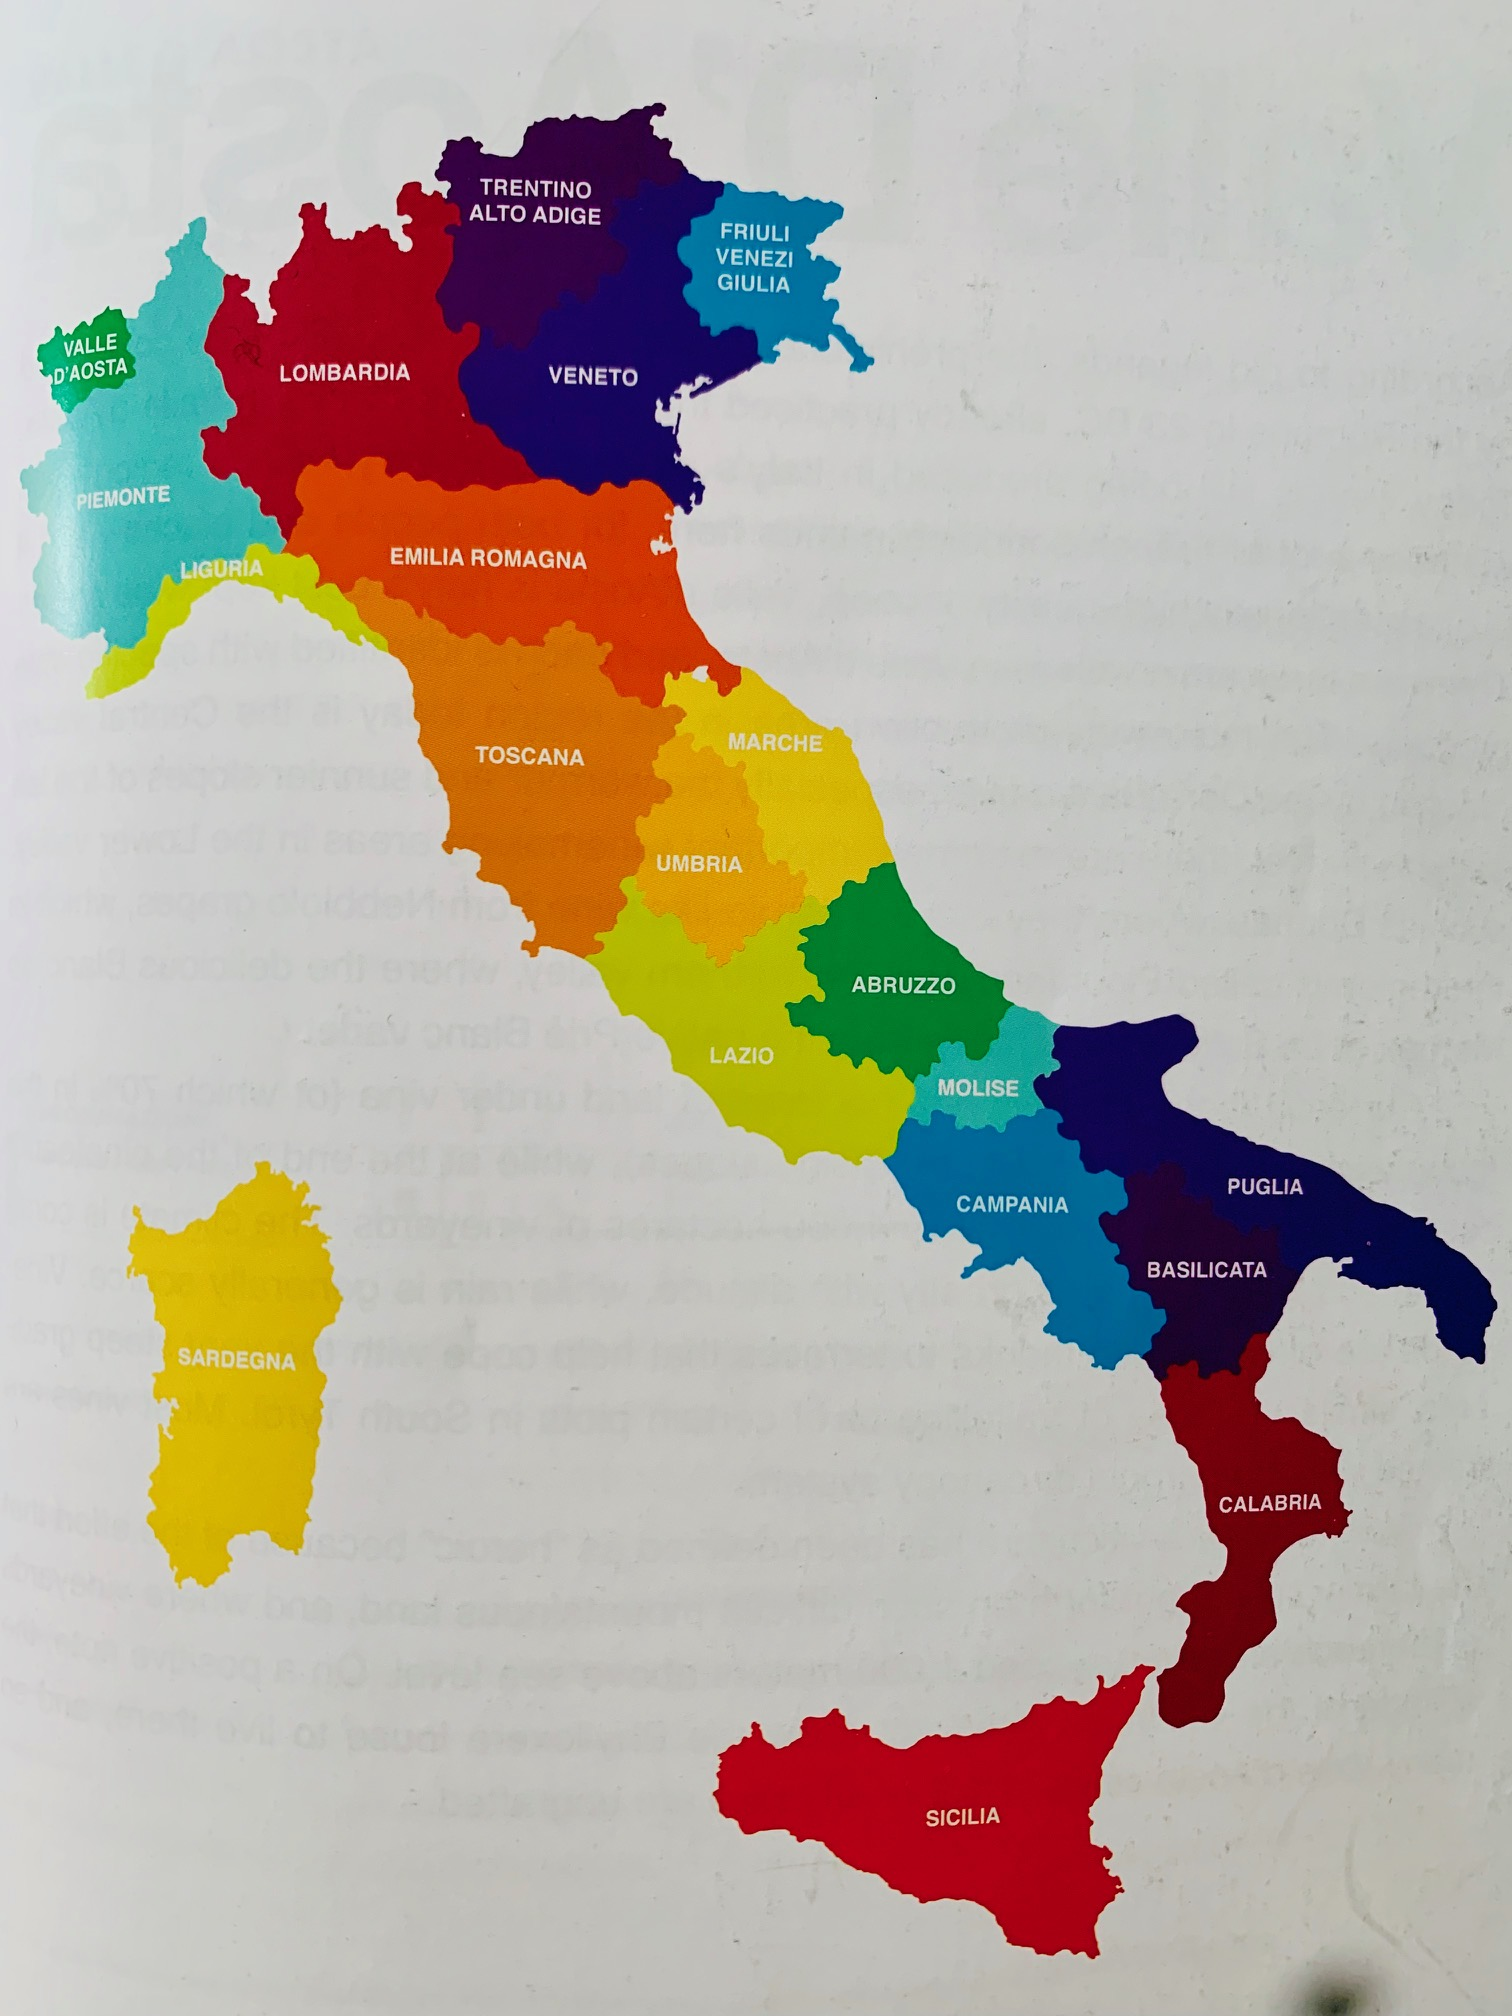 Image Credit:  Italian Wine Unplugged, 2017